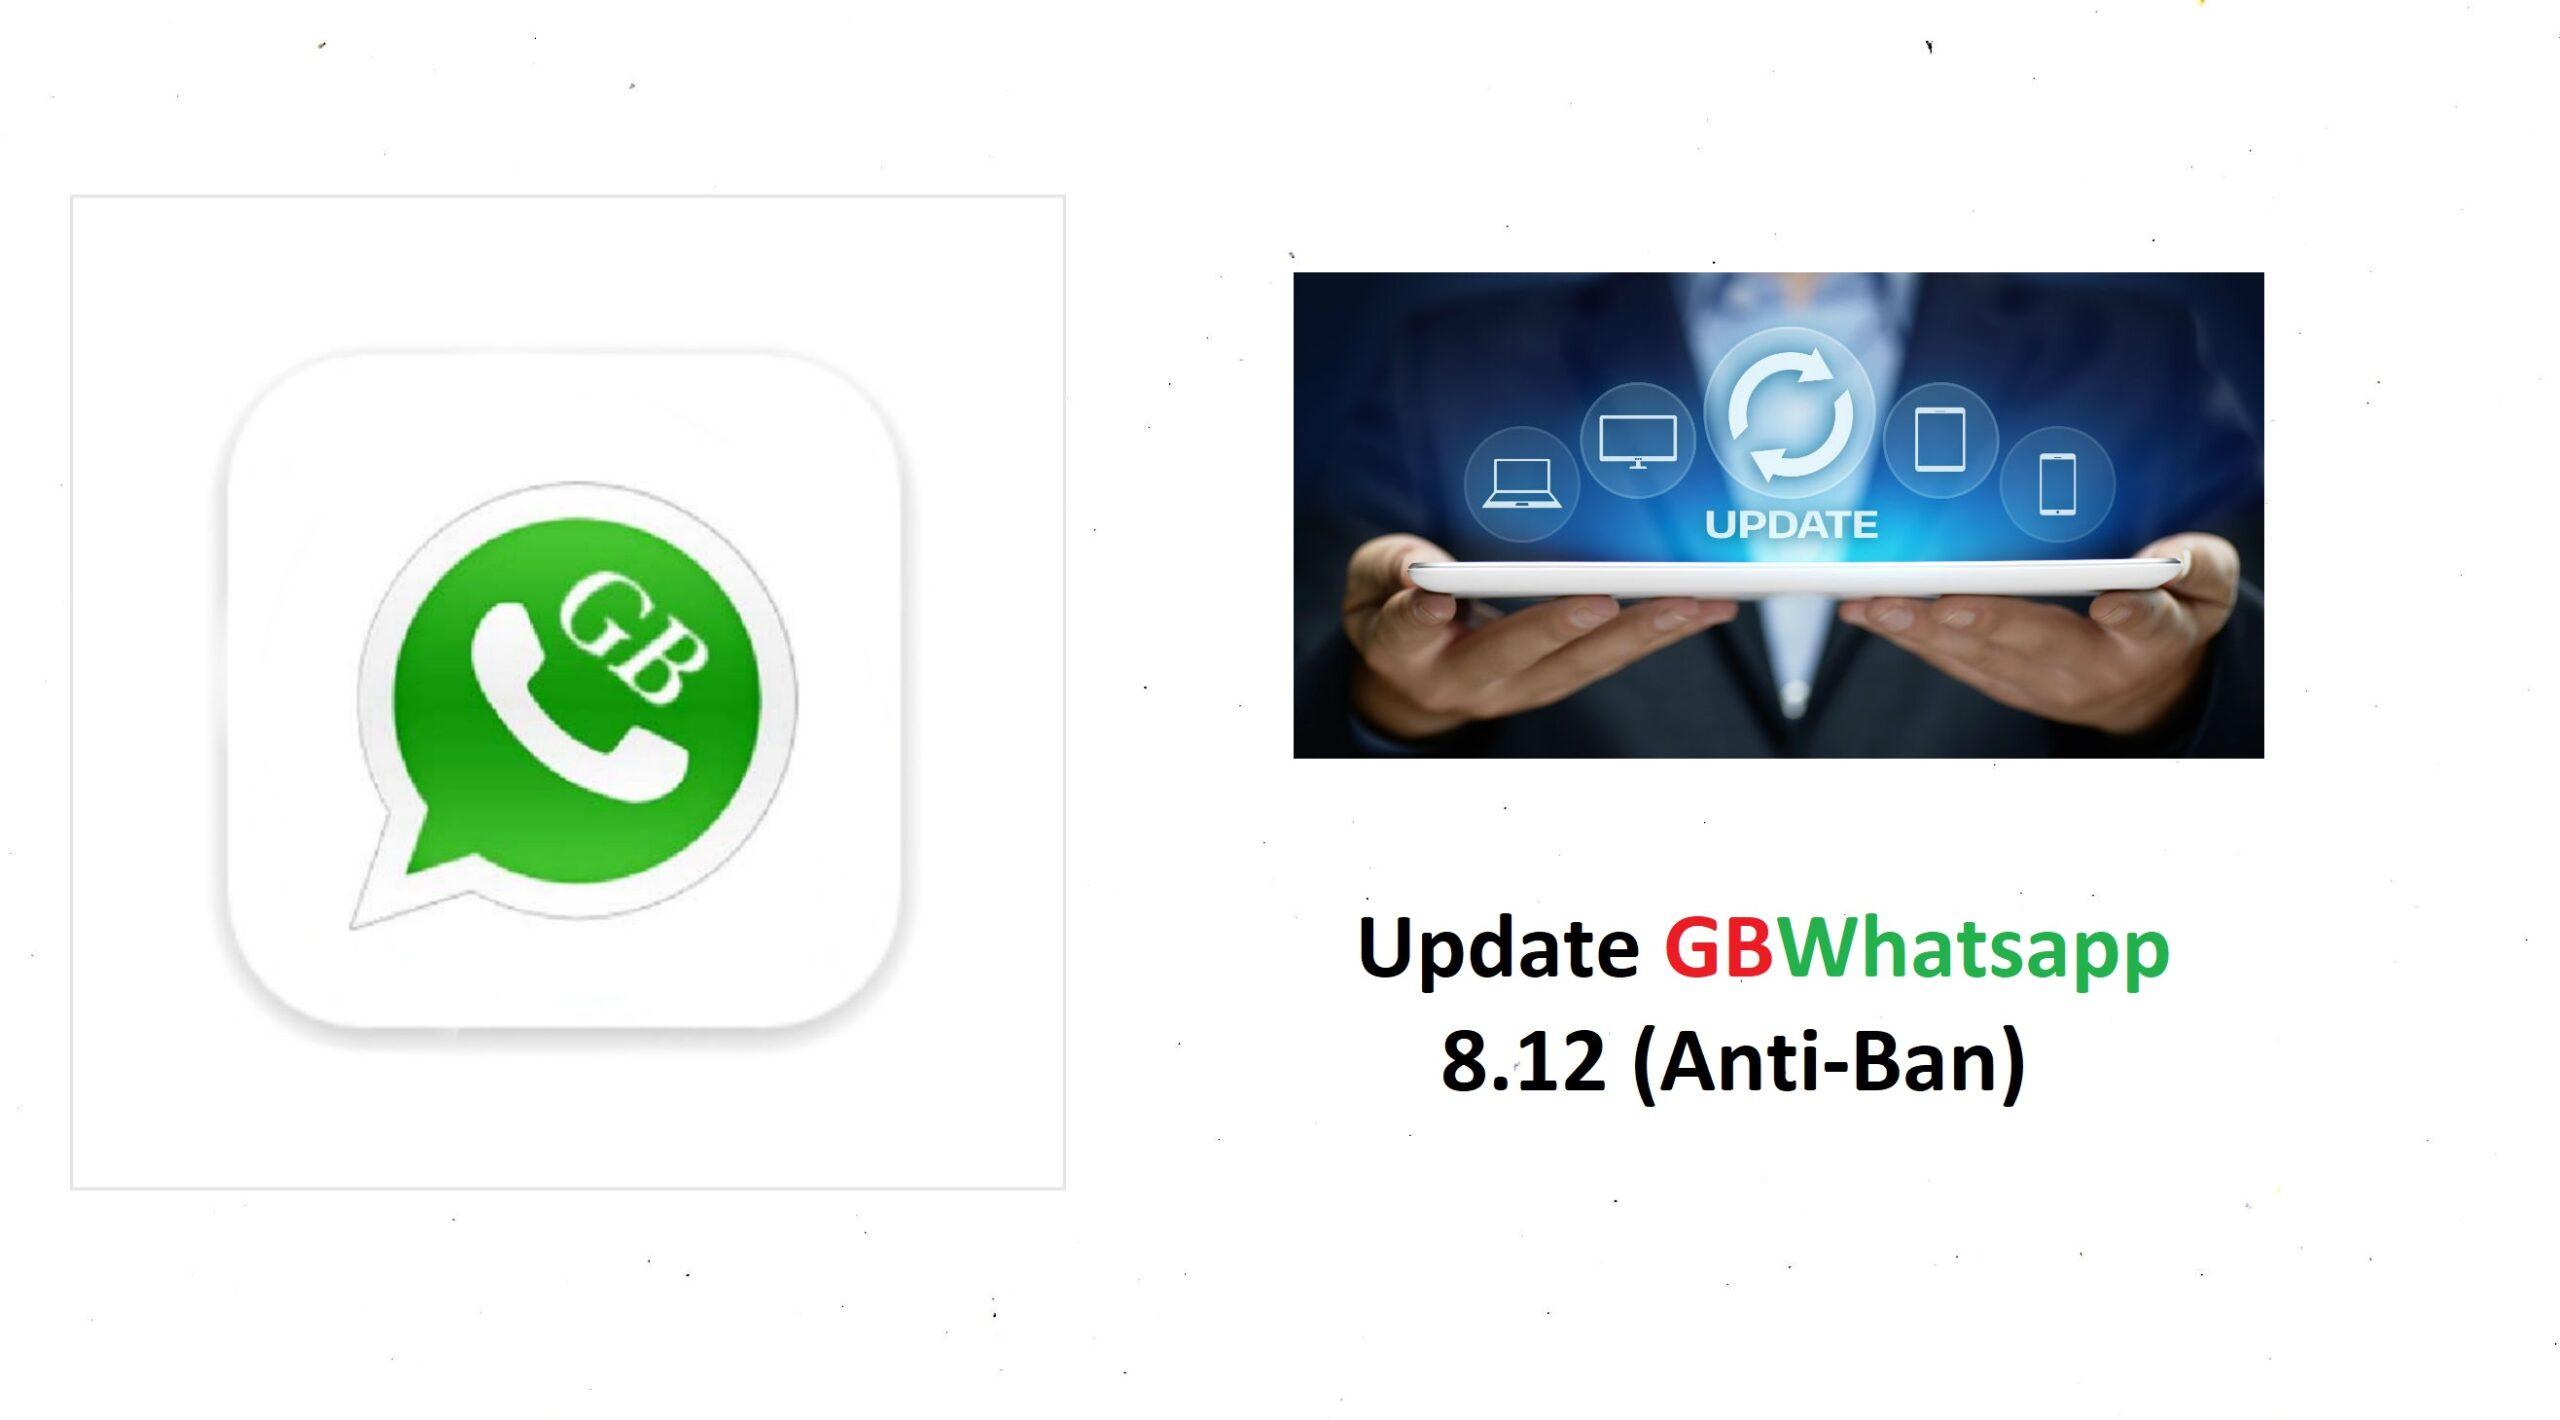 GBWhatsapp App Download